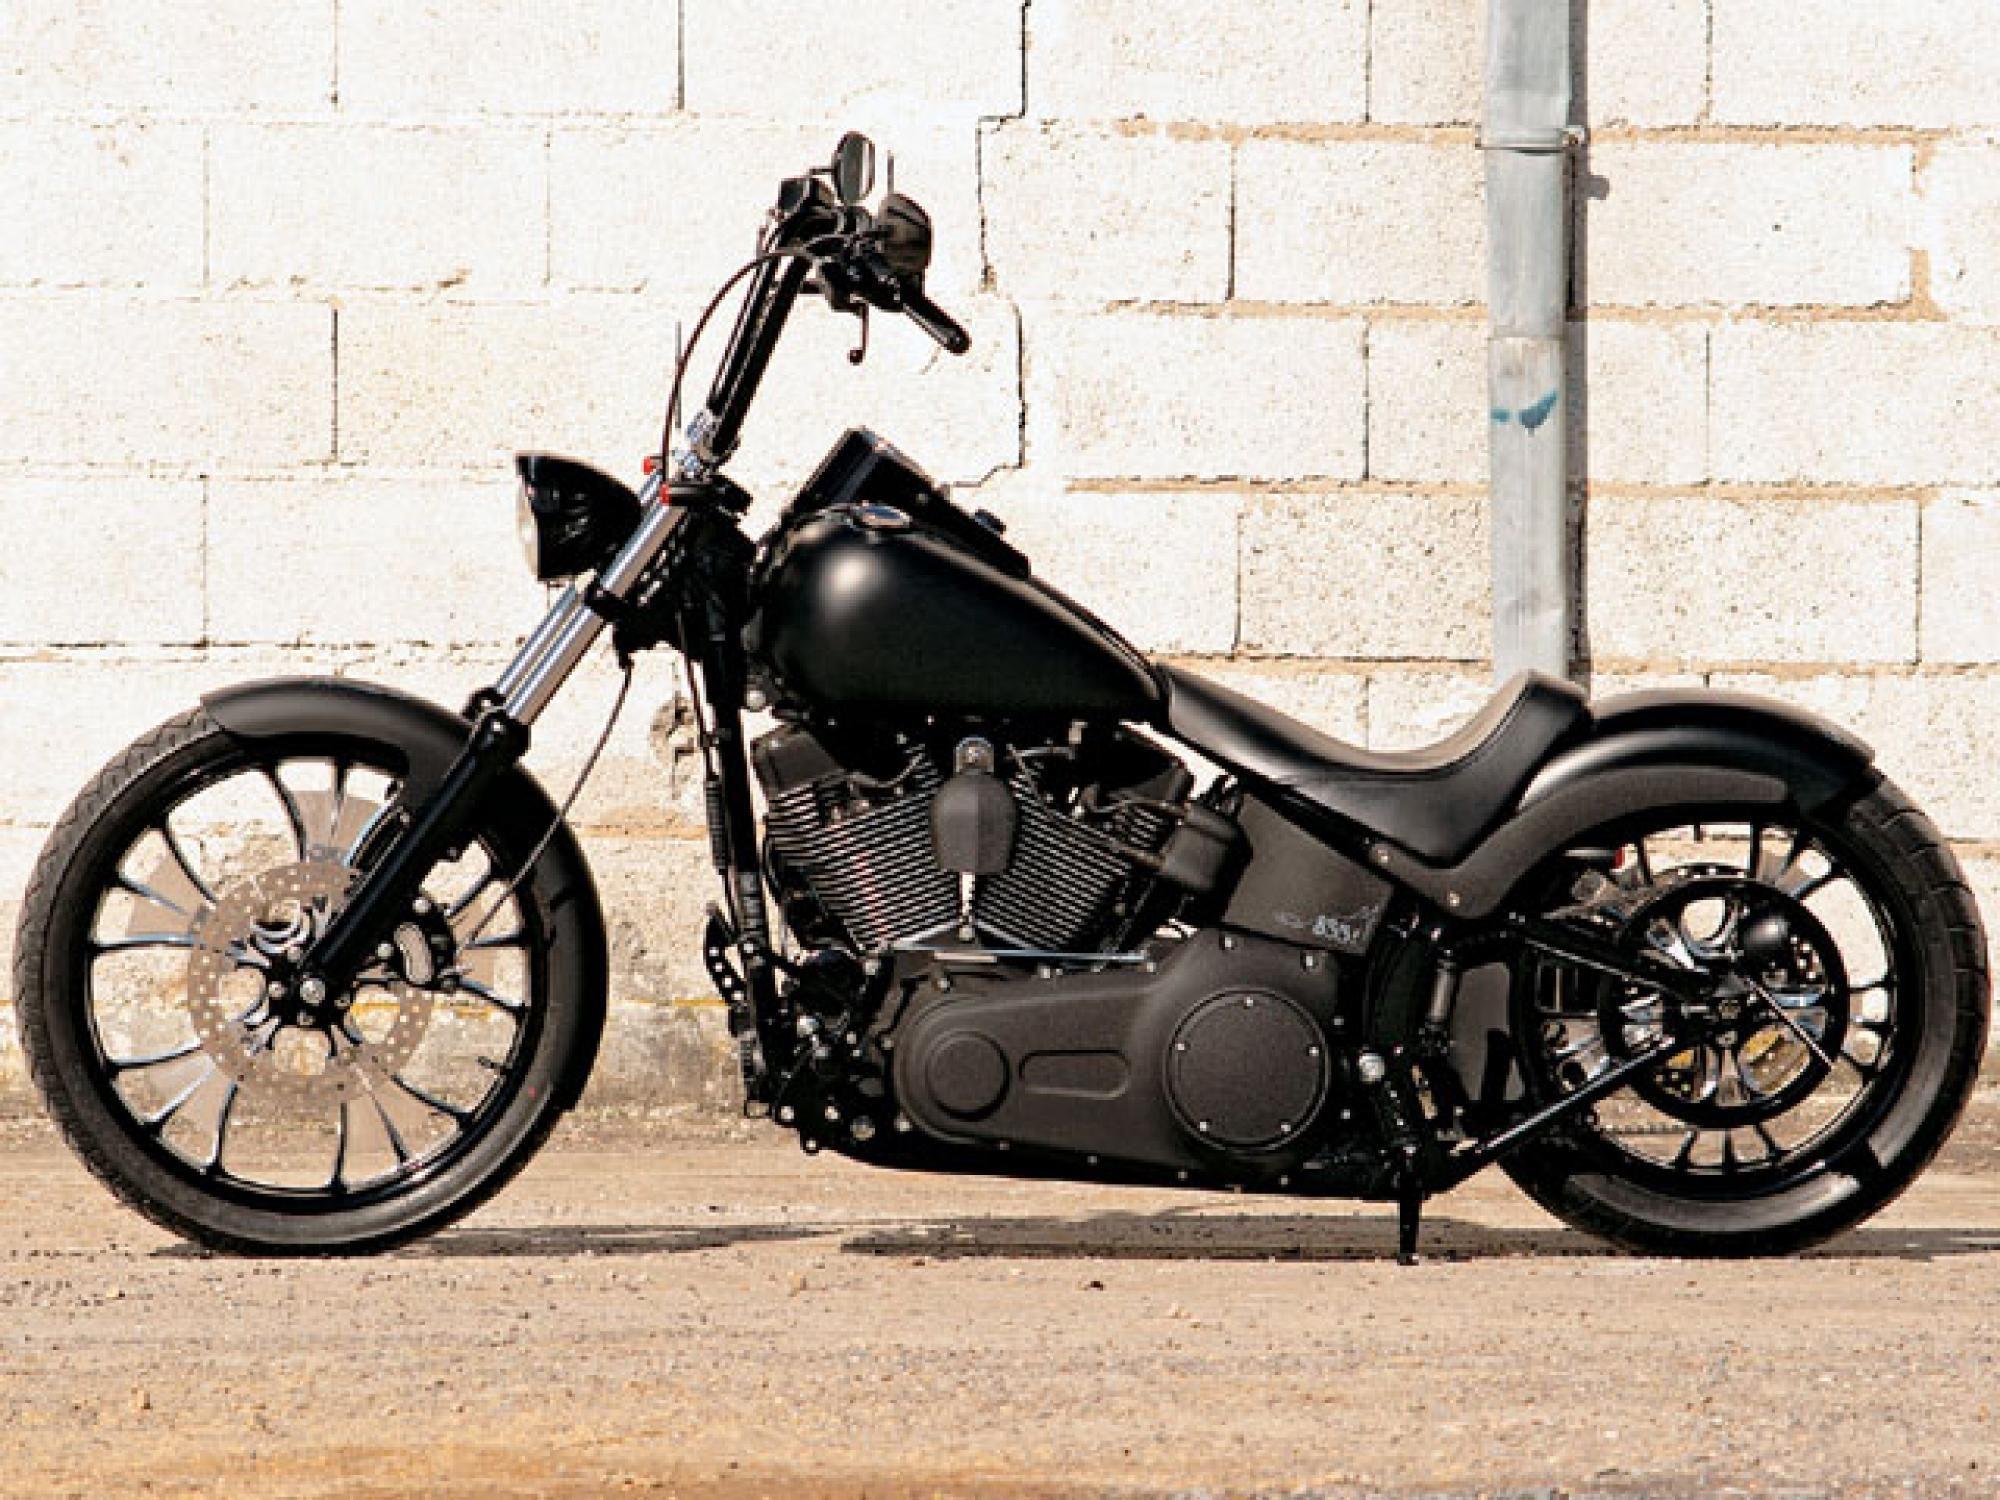 2007 Harley-Davidson Night Train - Pick Of The Pen | Hot Bike ...